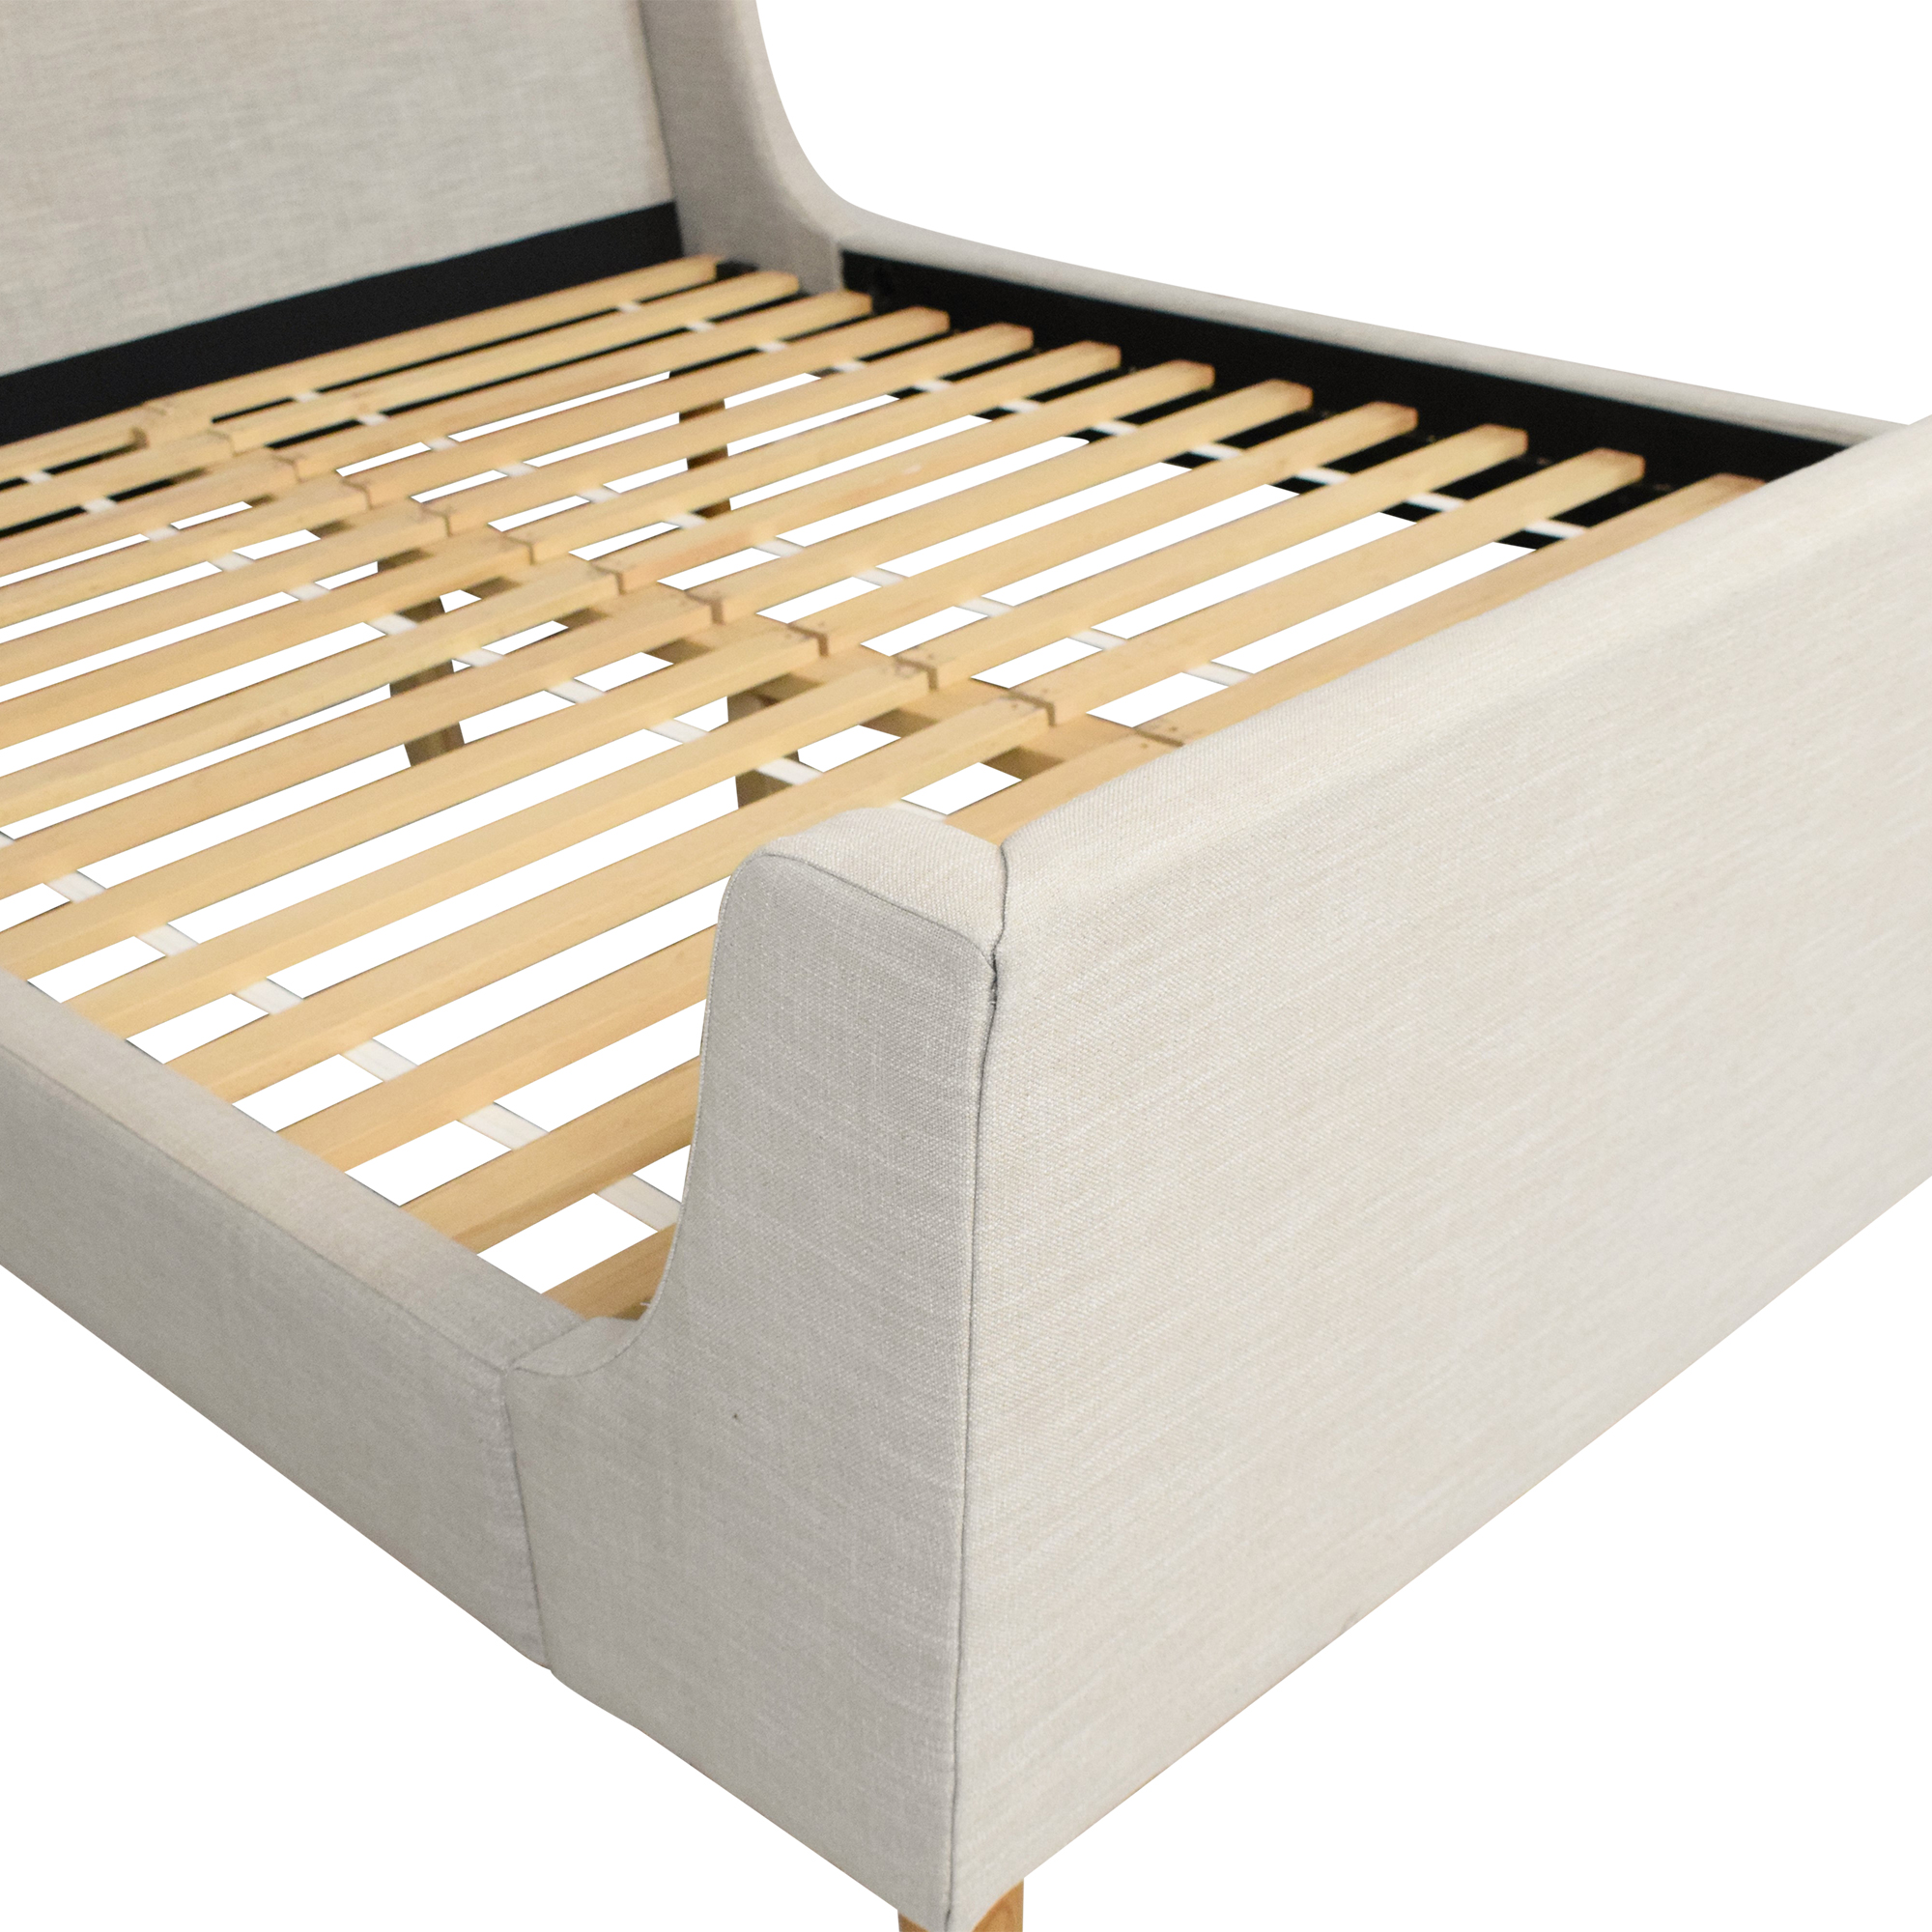 West Elm West Elm Queen Upholstered Sleigh Bed ct